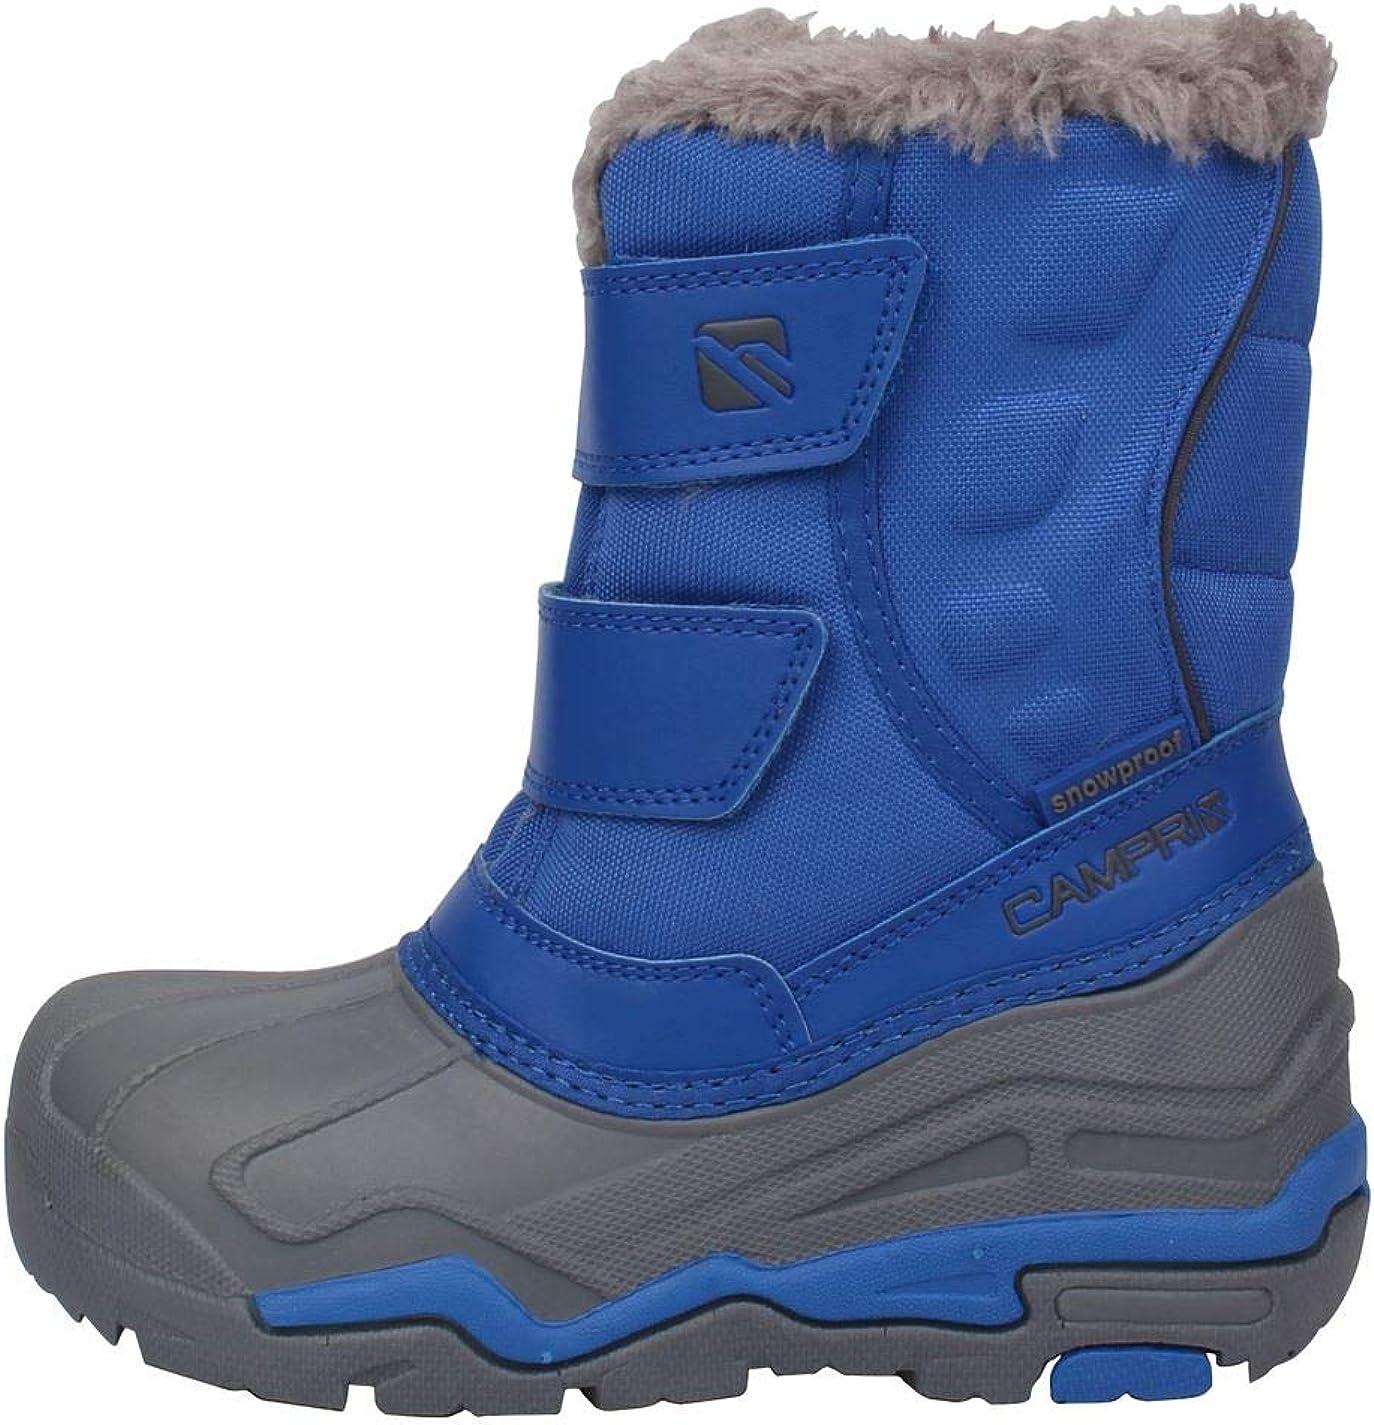 CAMPRI JUNIOR SNOW JOGGER BOOTS WINTER OUTDOOR WALKING NAVY LIGHT WEIGHT UK 6